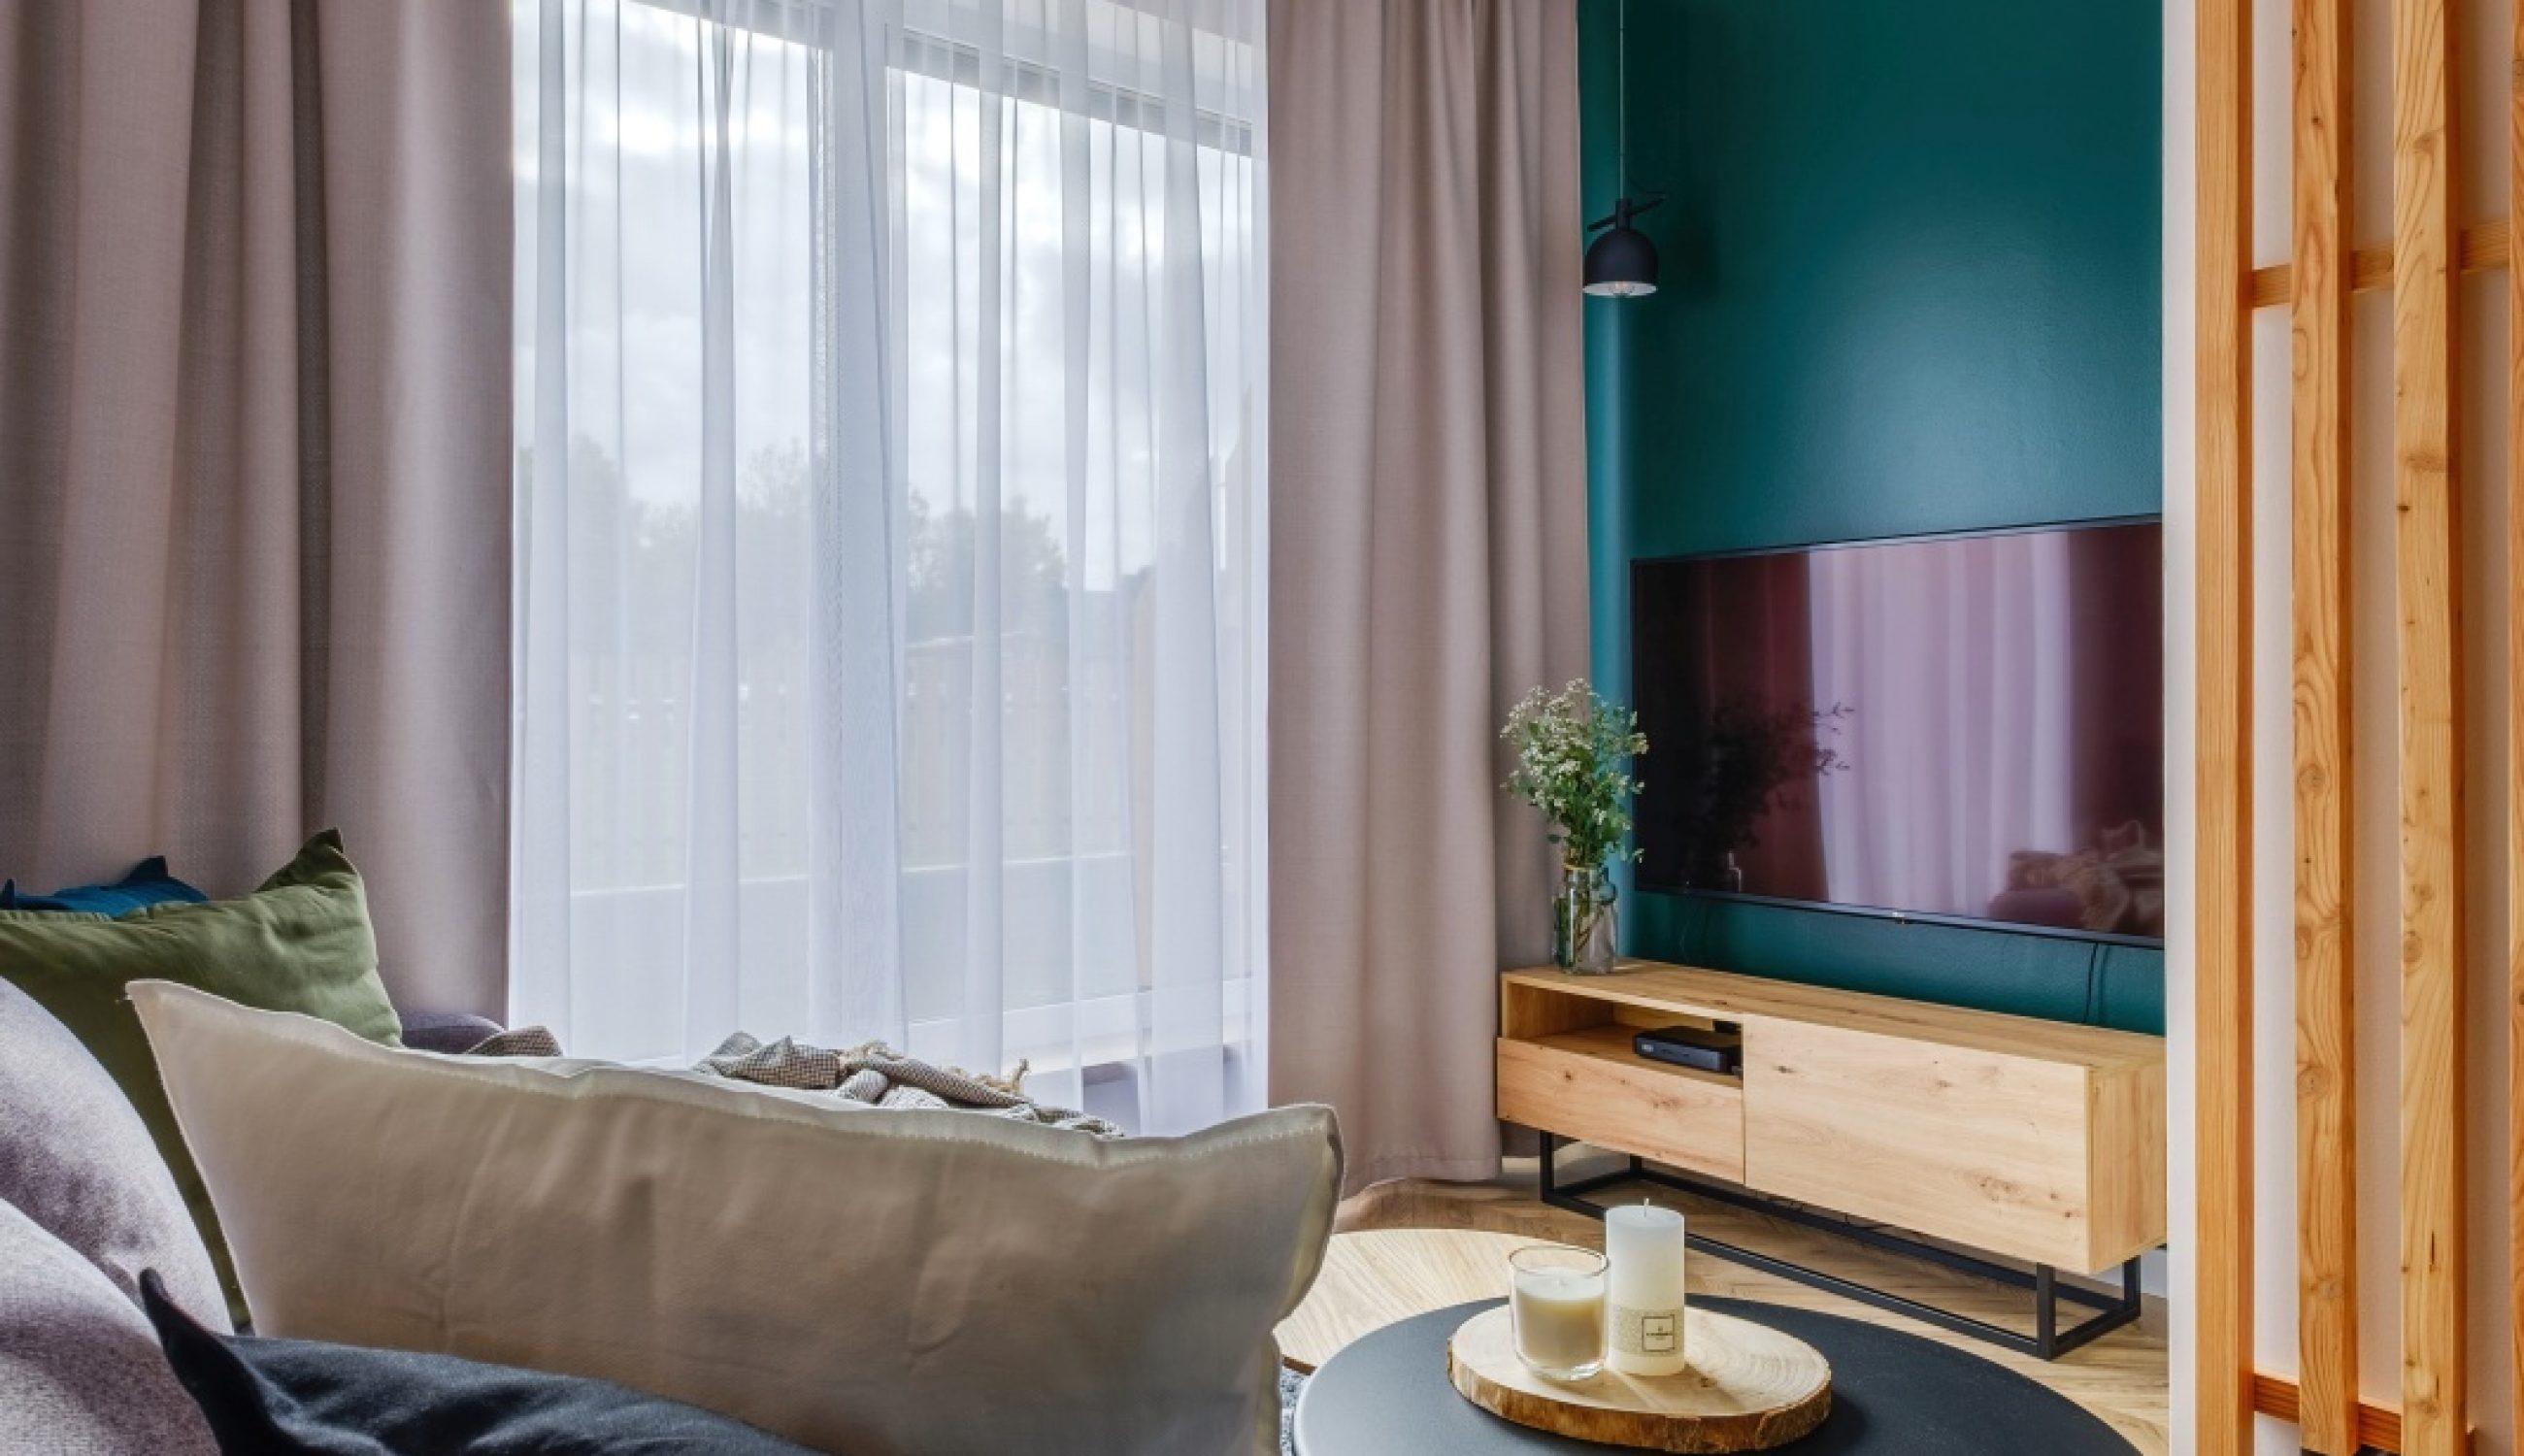 Apartamenty NOVA BIAŁKA Białka Tatrzańska apartament 5 salon rtv